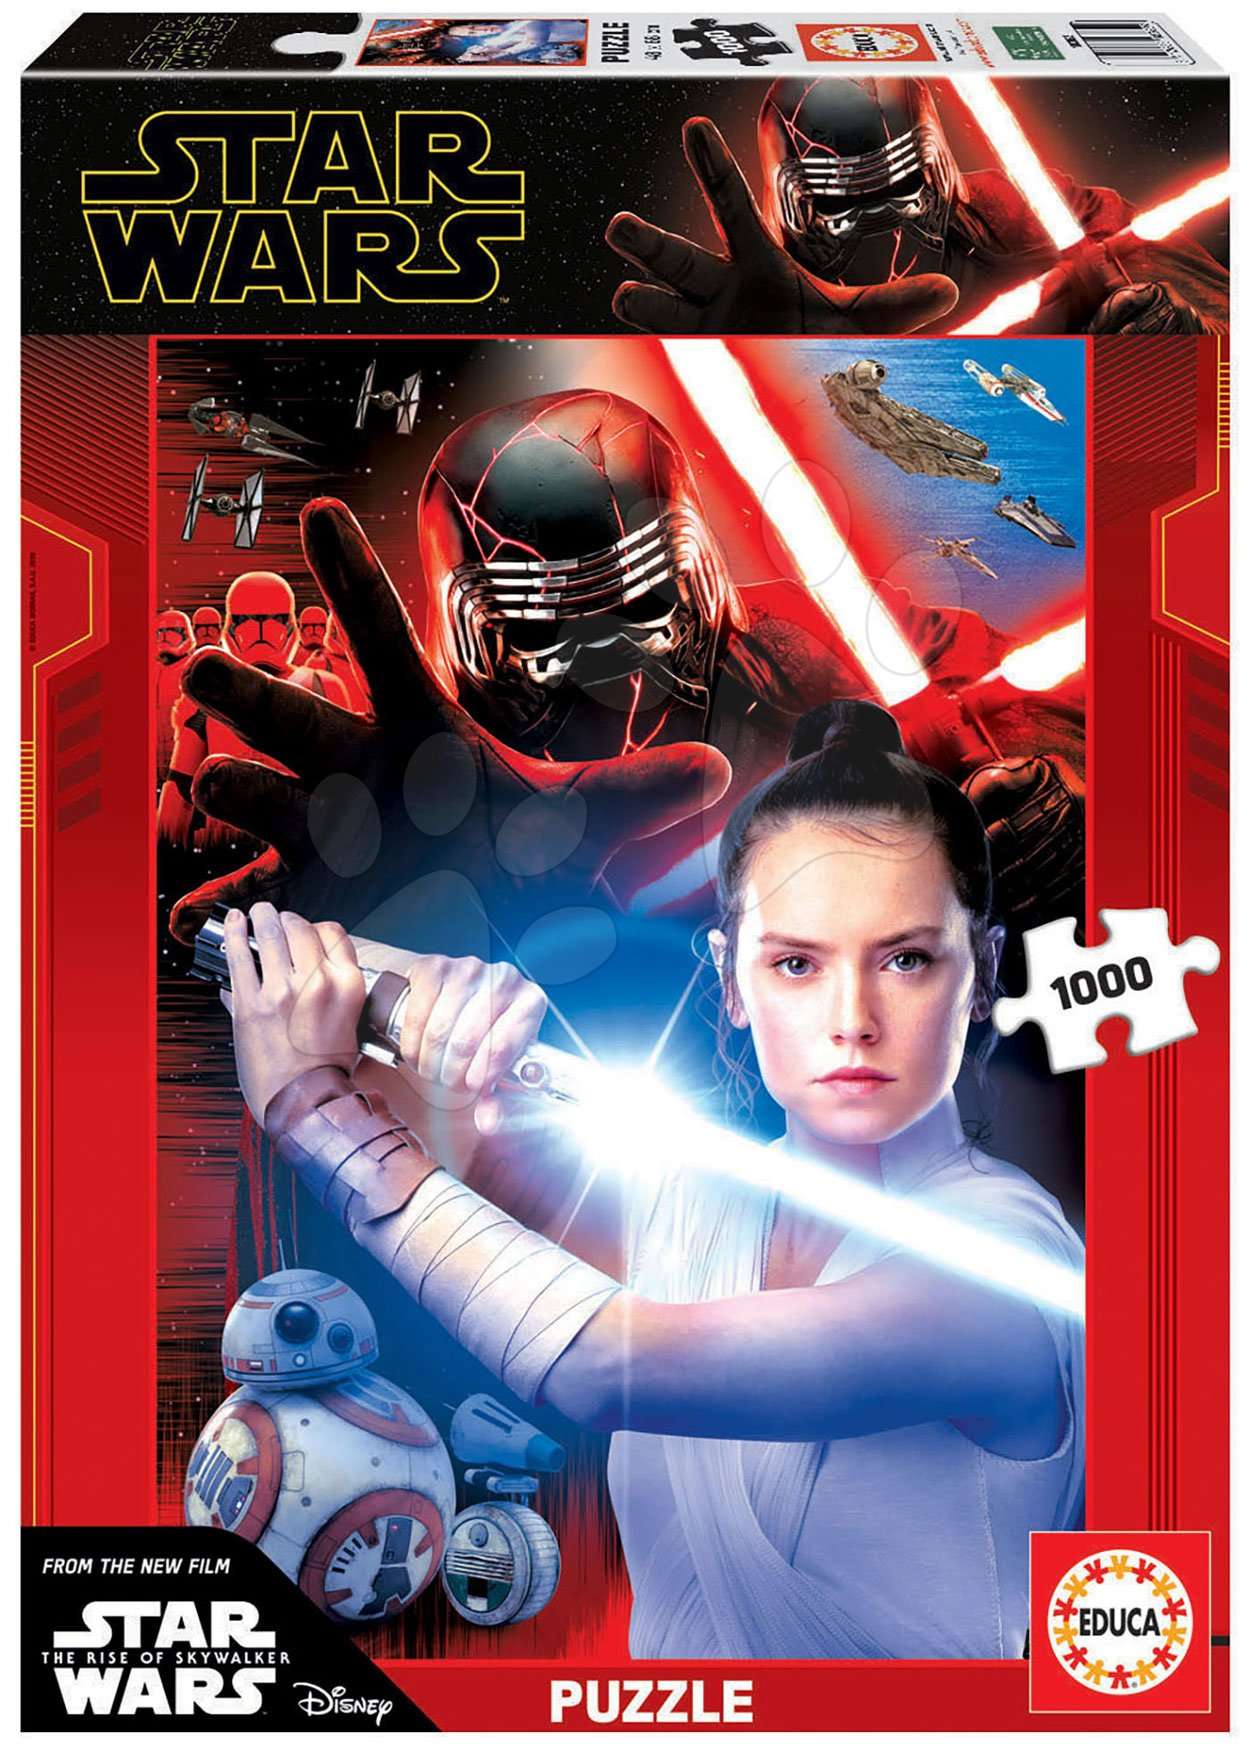 Puzzle Star Wars Episod IX The rise of Skywalker Educa 1000 piese și lipici Fix de la 11 ani